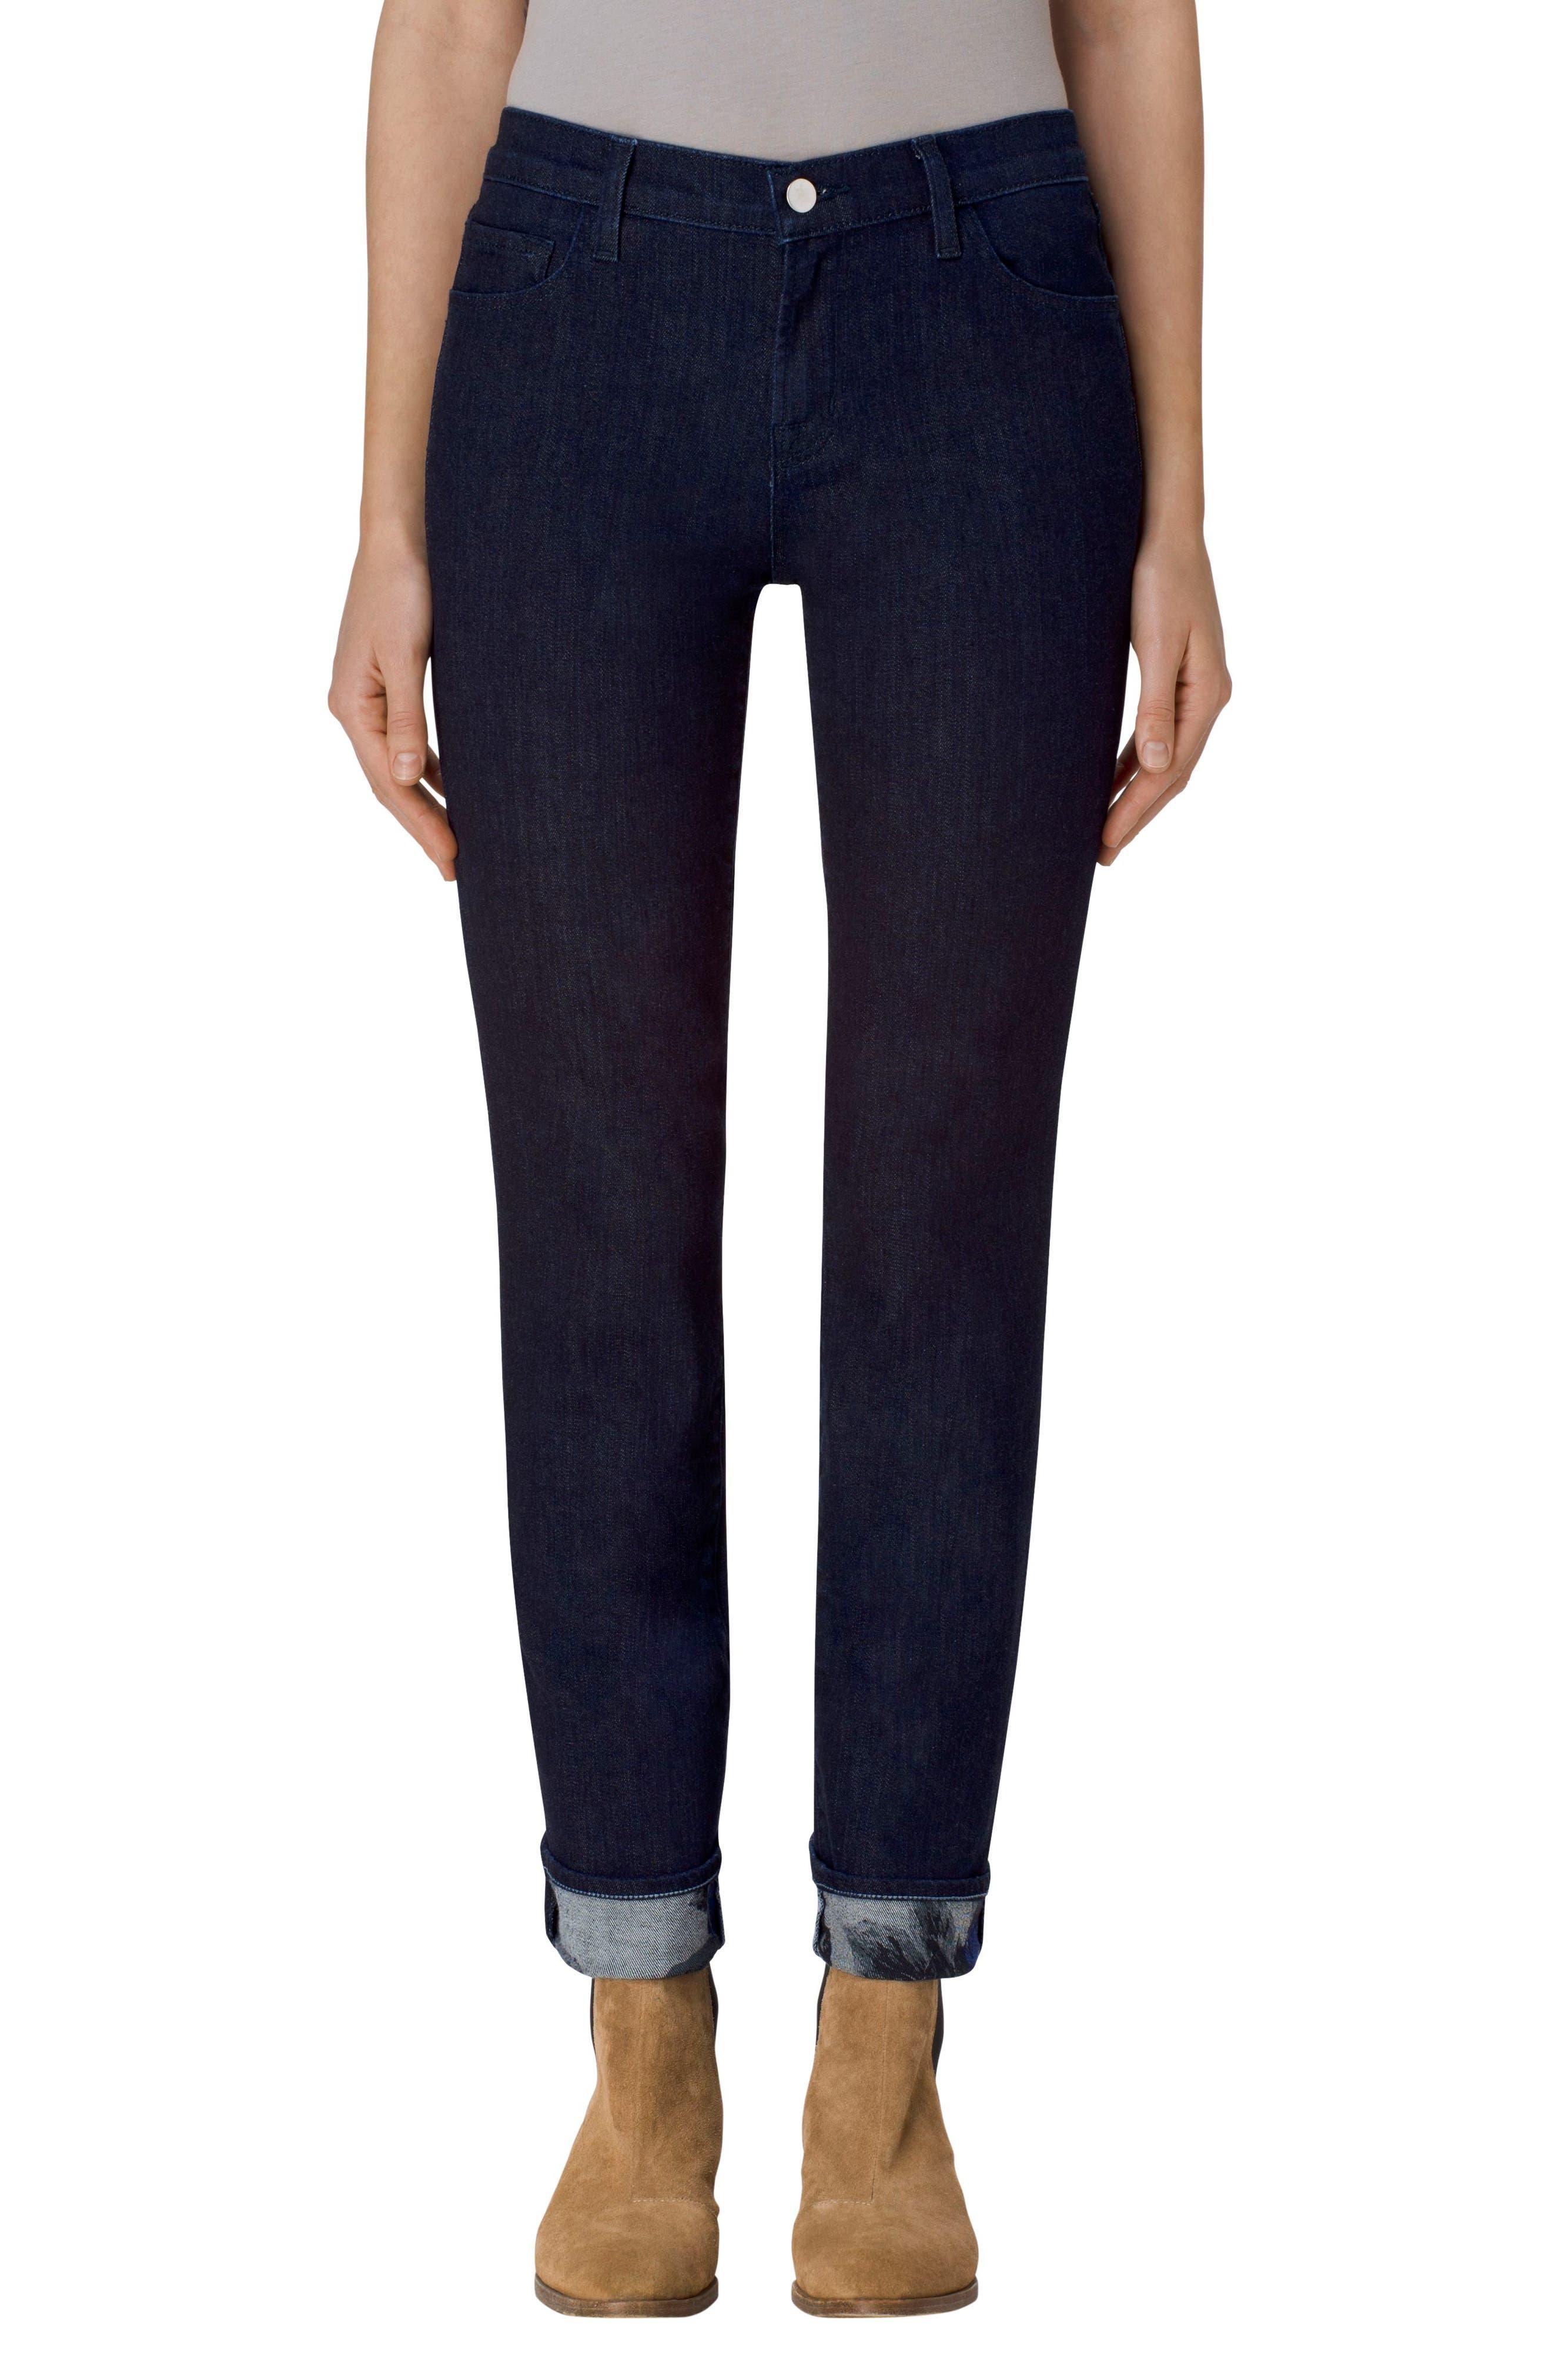 Alternate Image 1 Selected - J Brand Maude Cigarette Leg Jeans (Corsage)